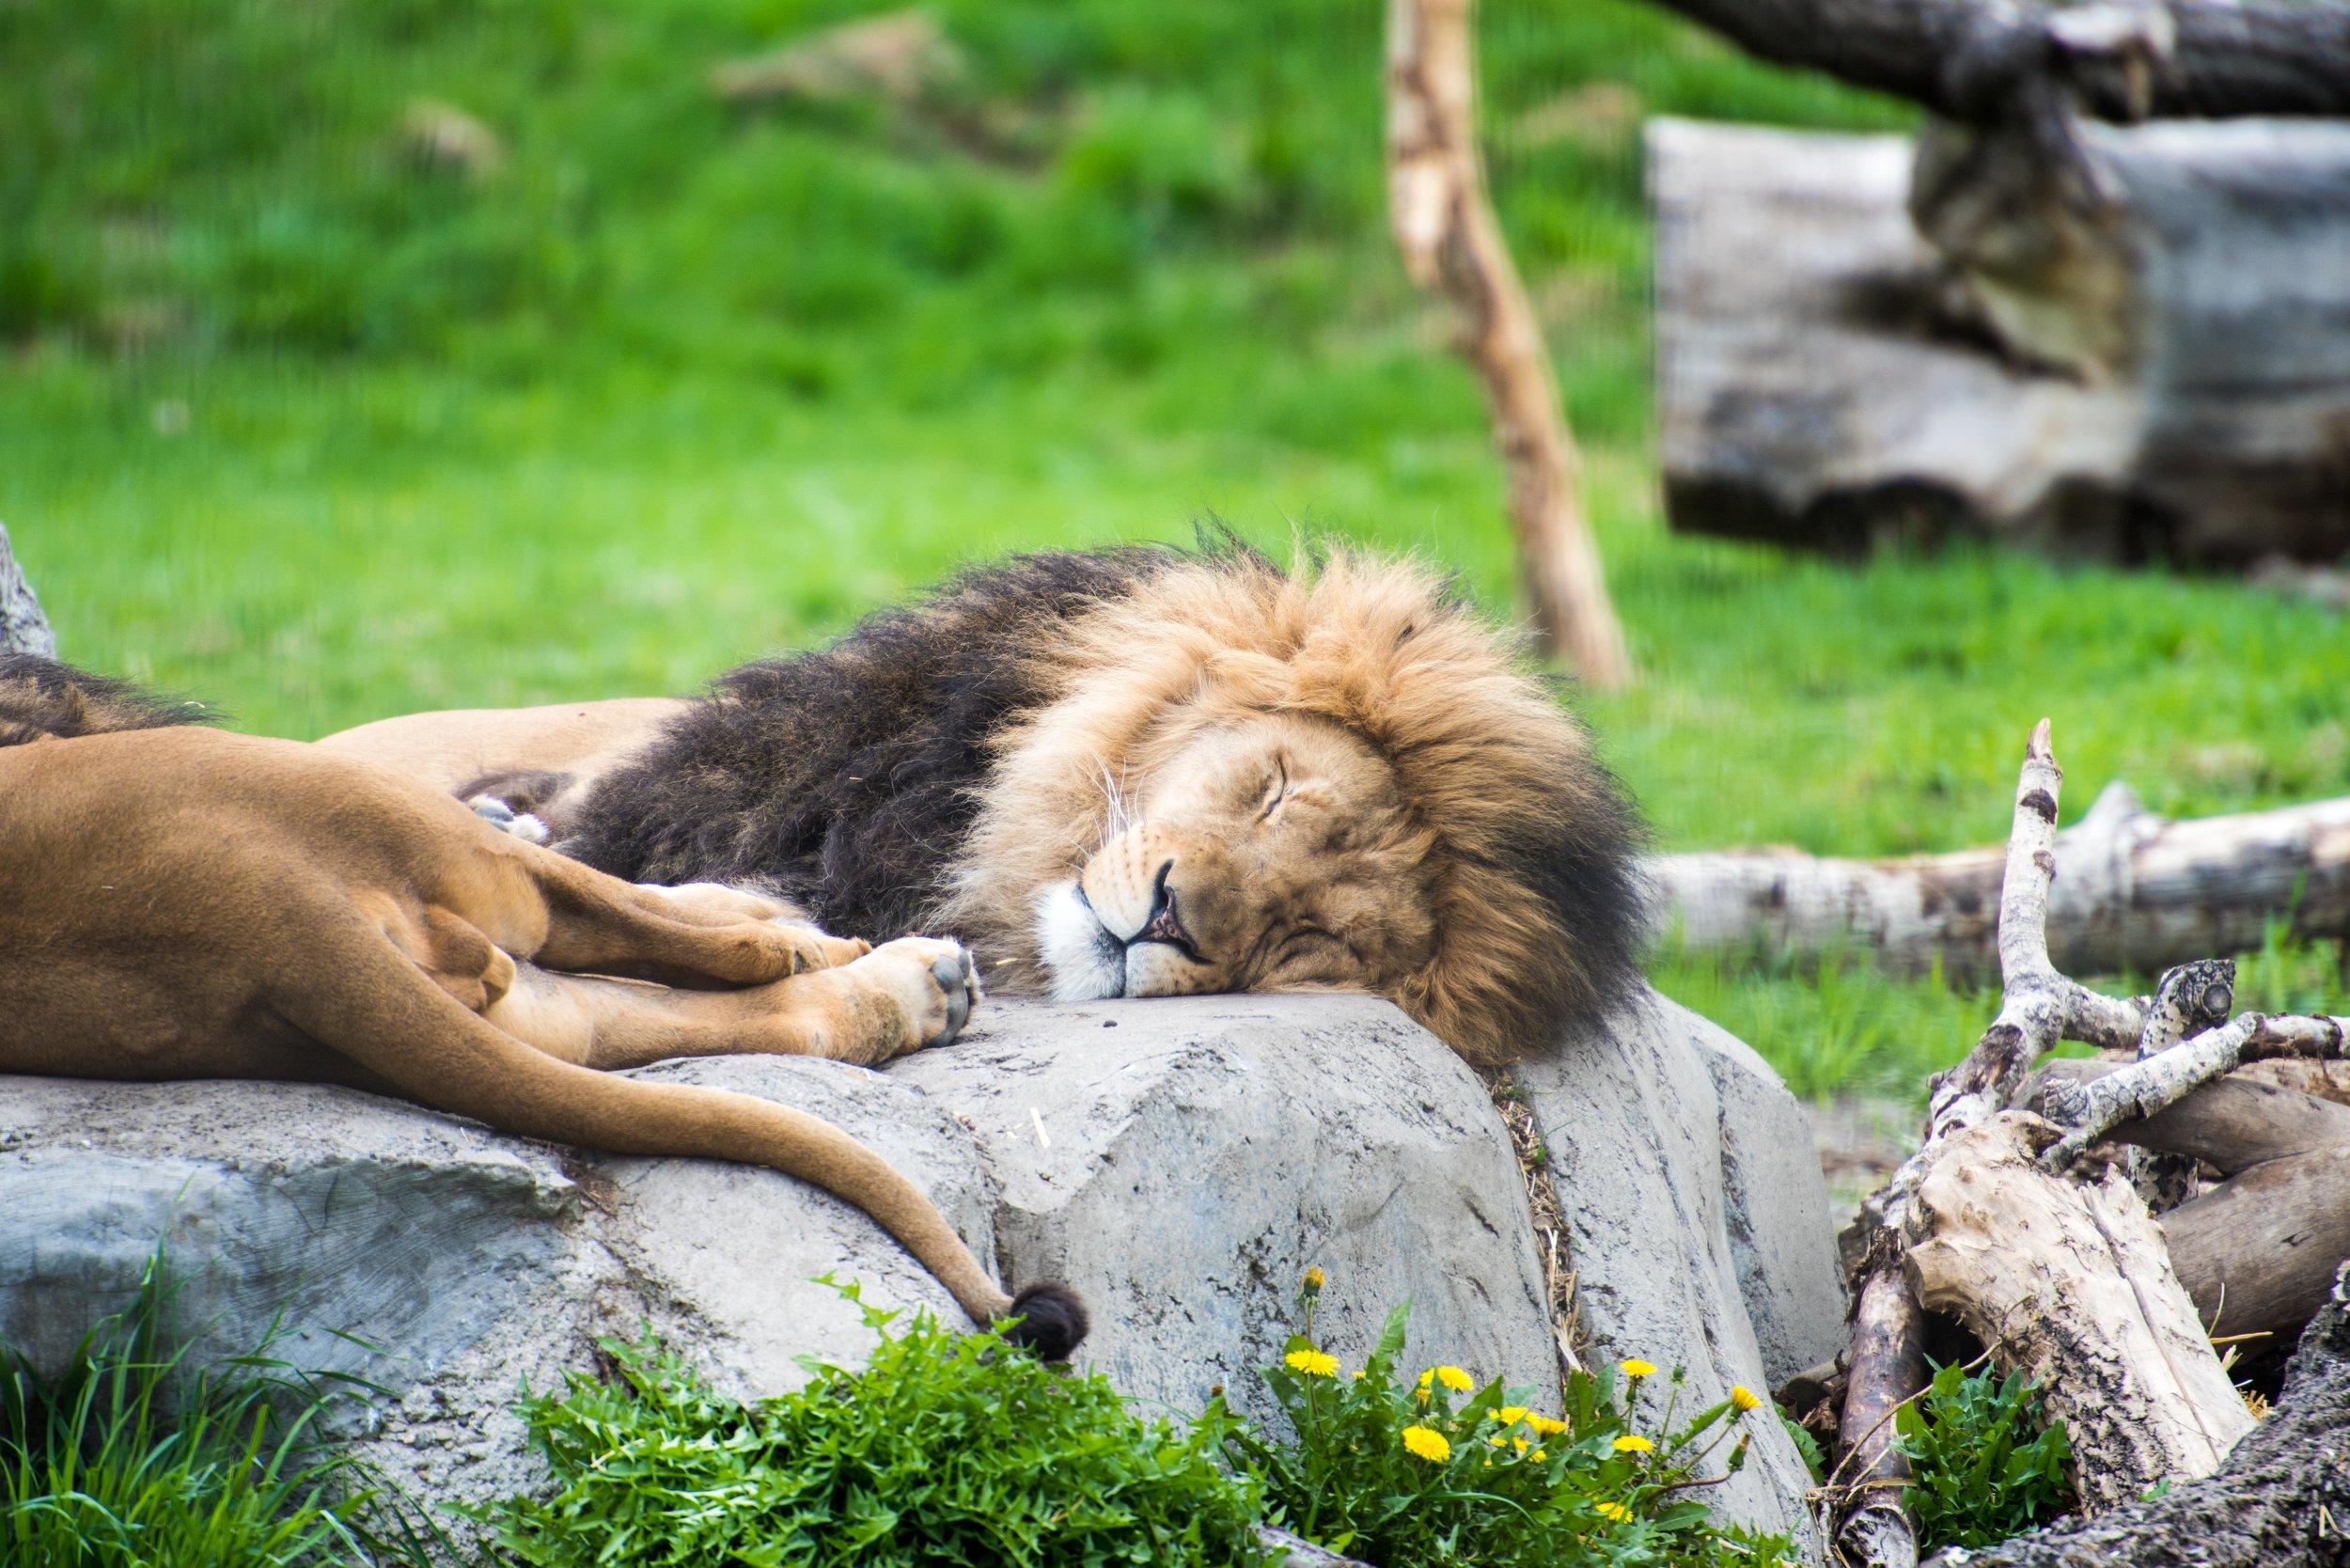 calgary zoo-3630.jpg